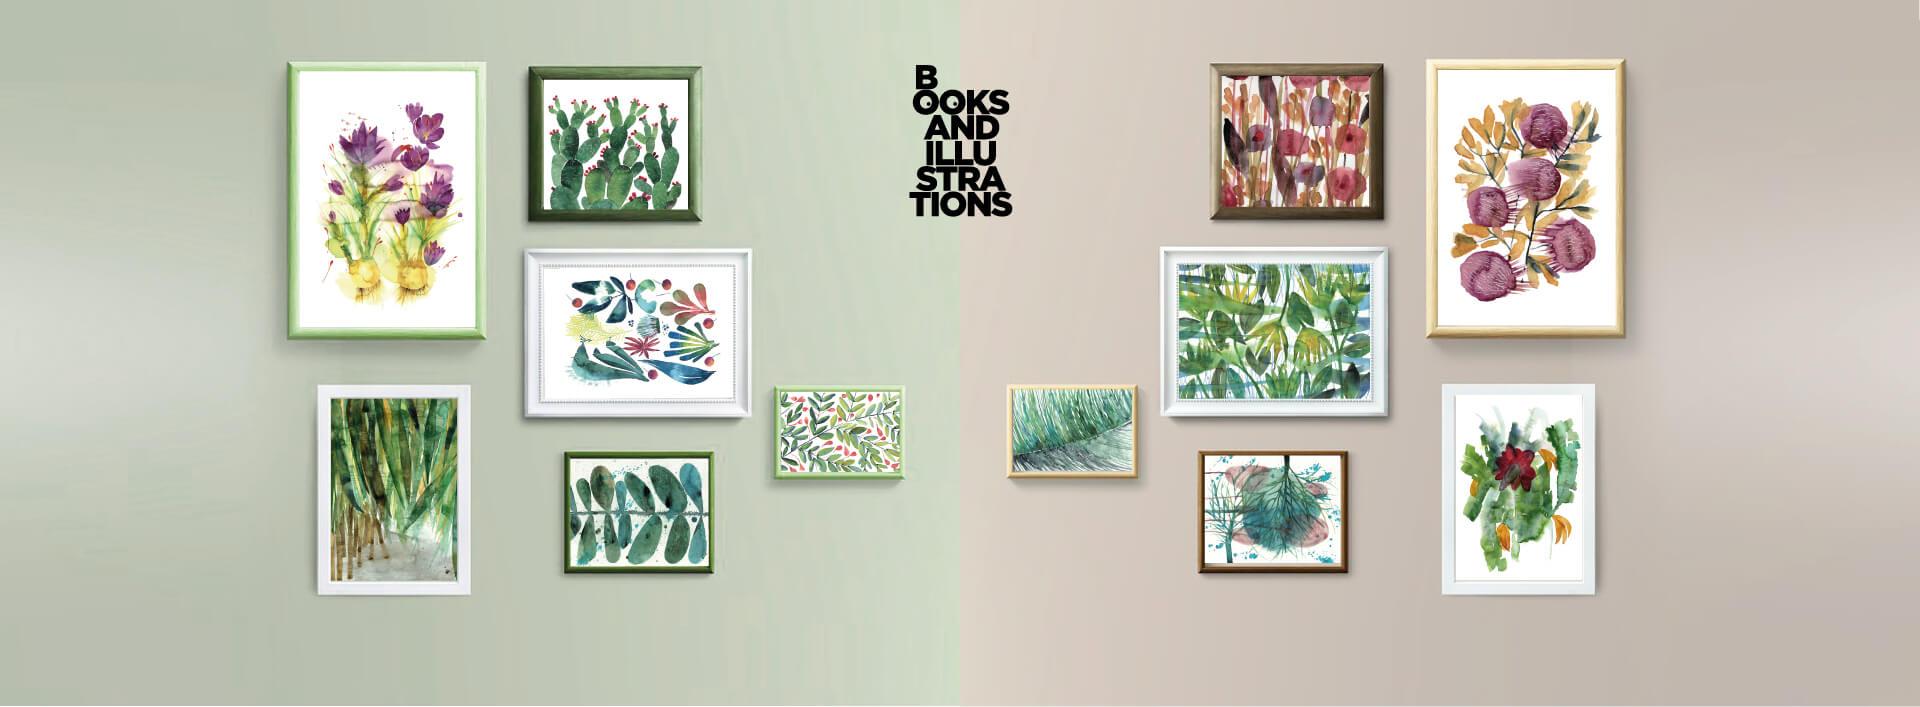 Illustrazioni botanica